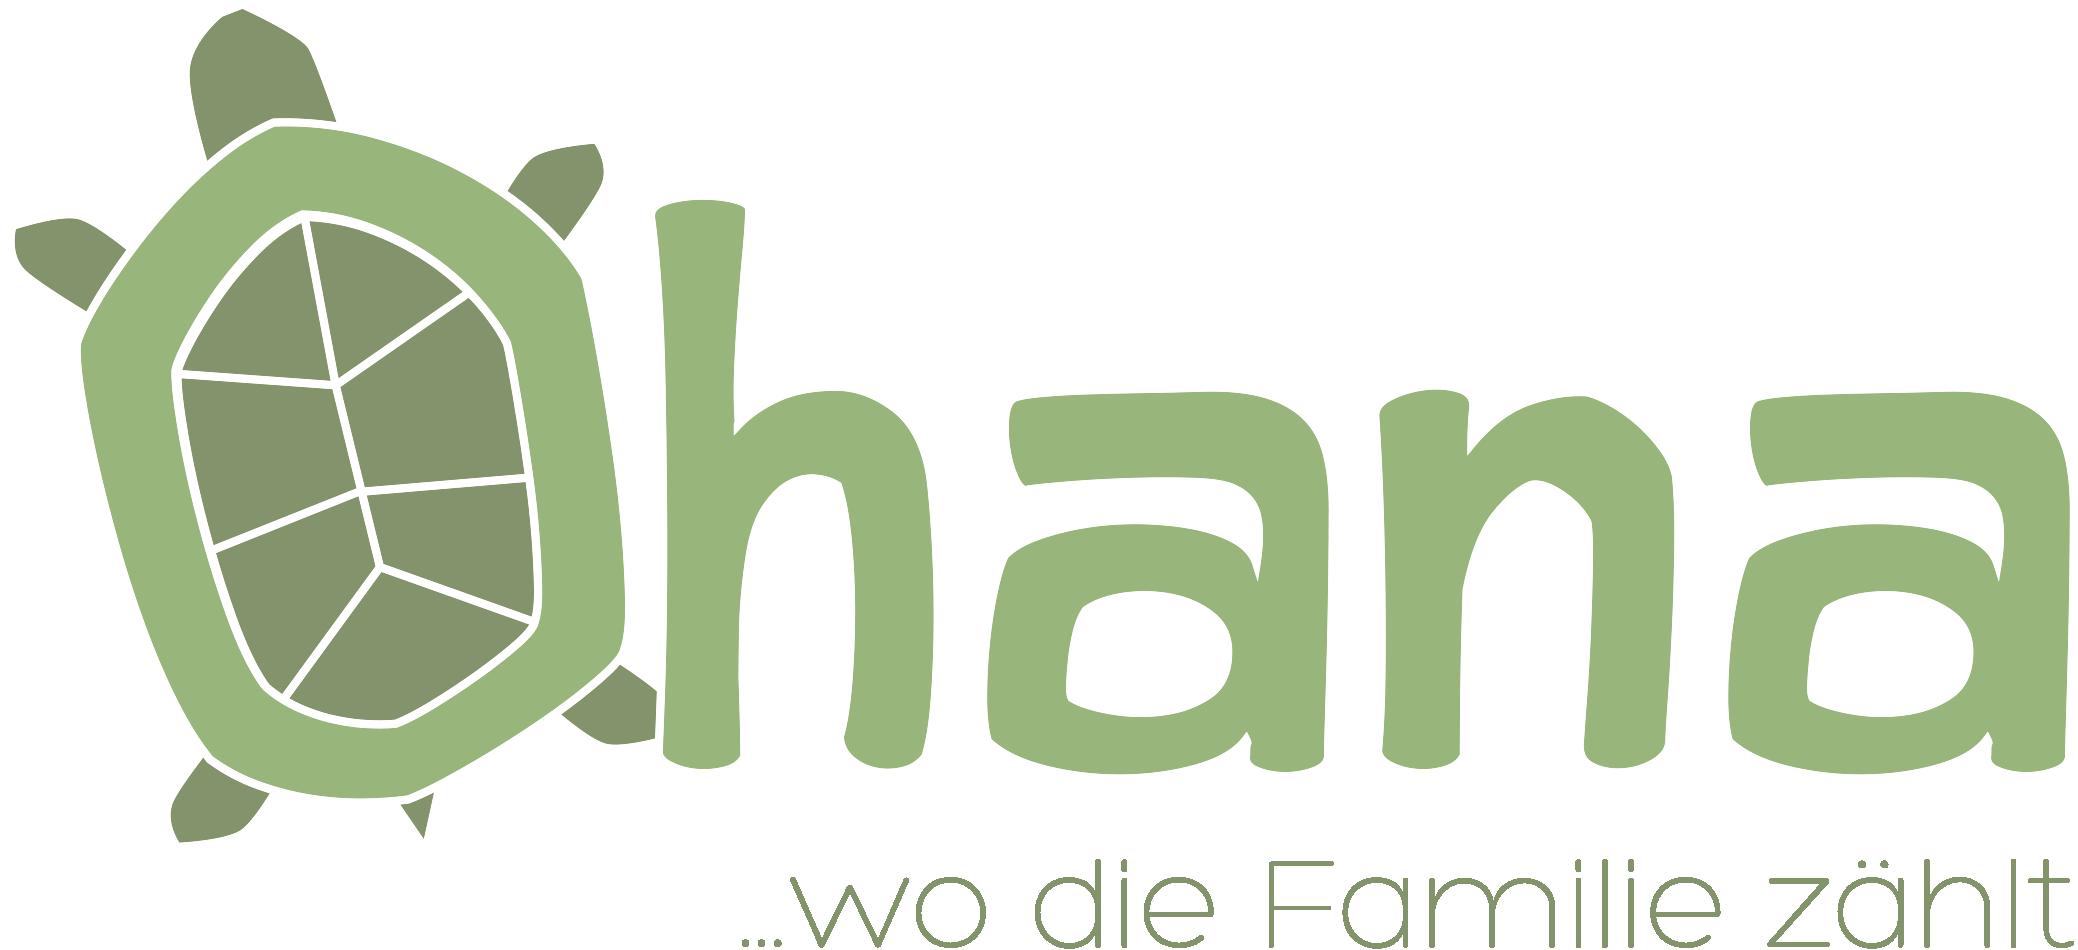 Herzlich Willkommen! | Ohana Familienbildung